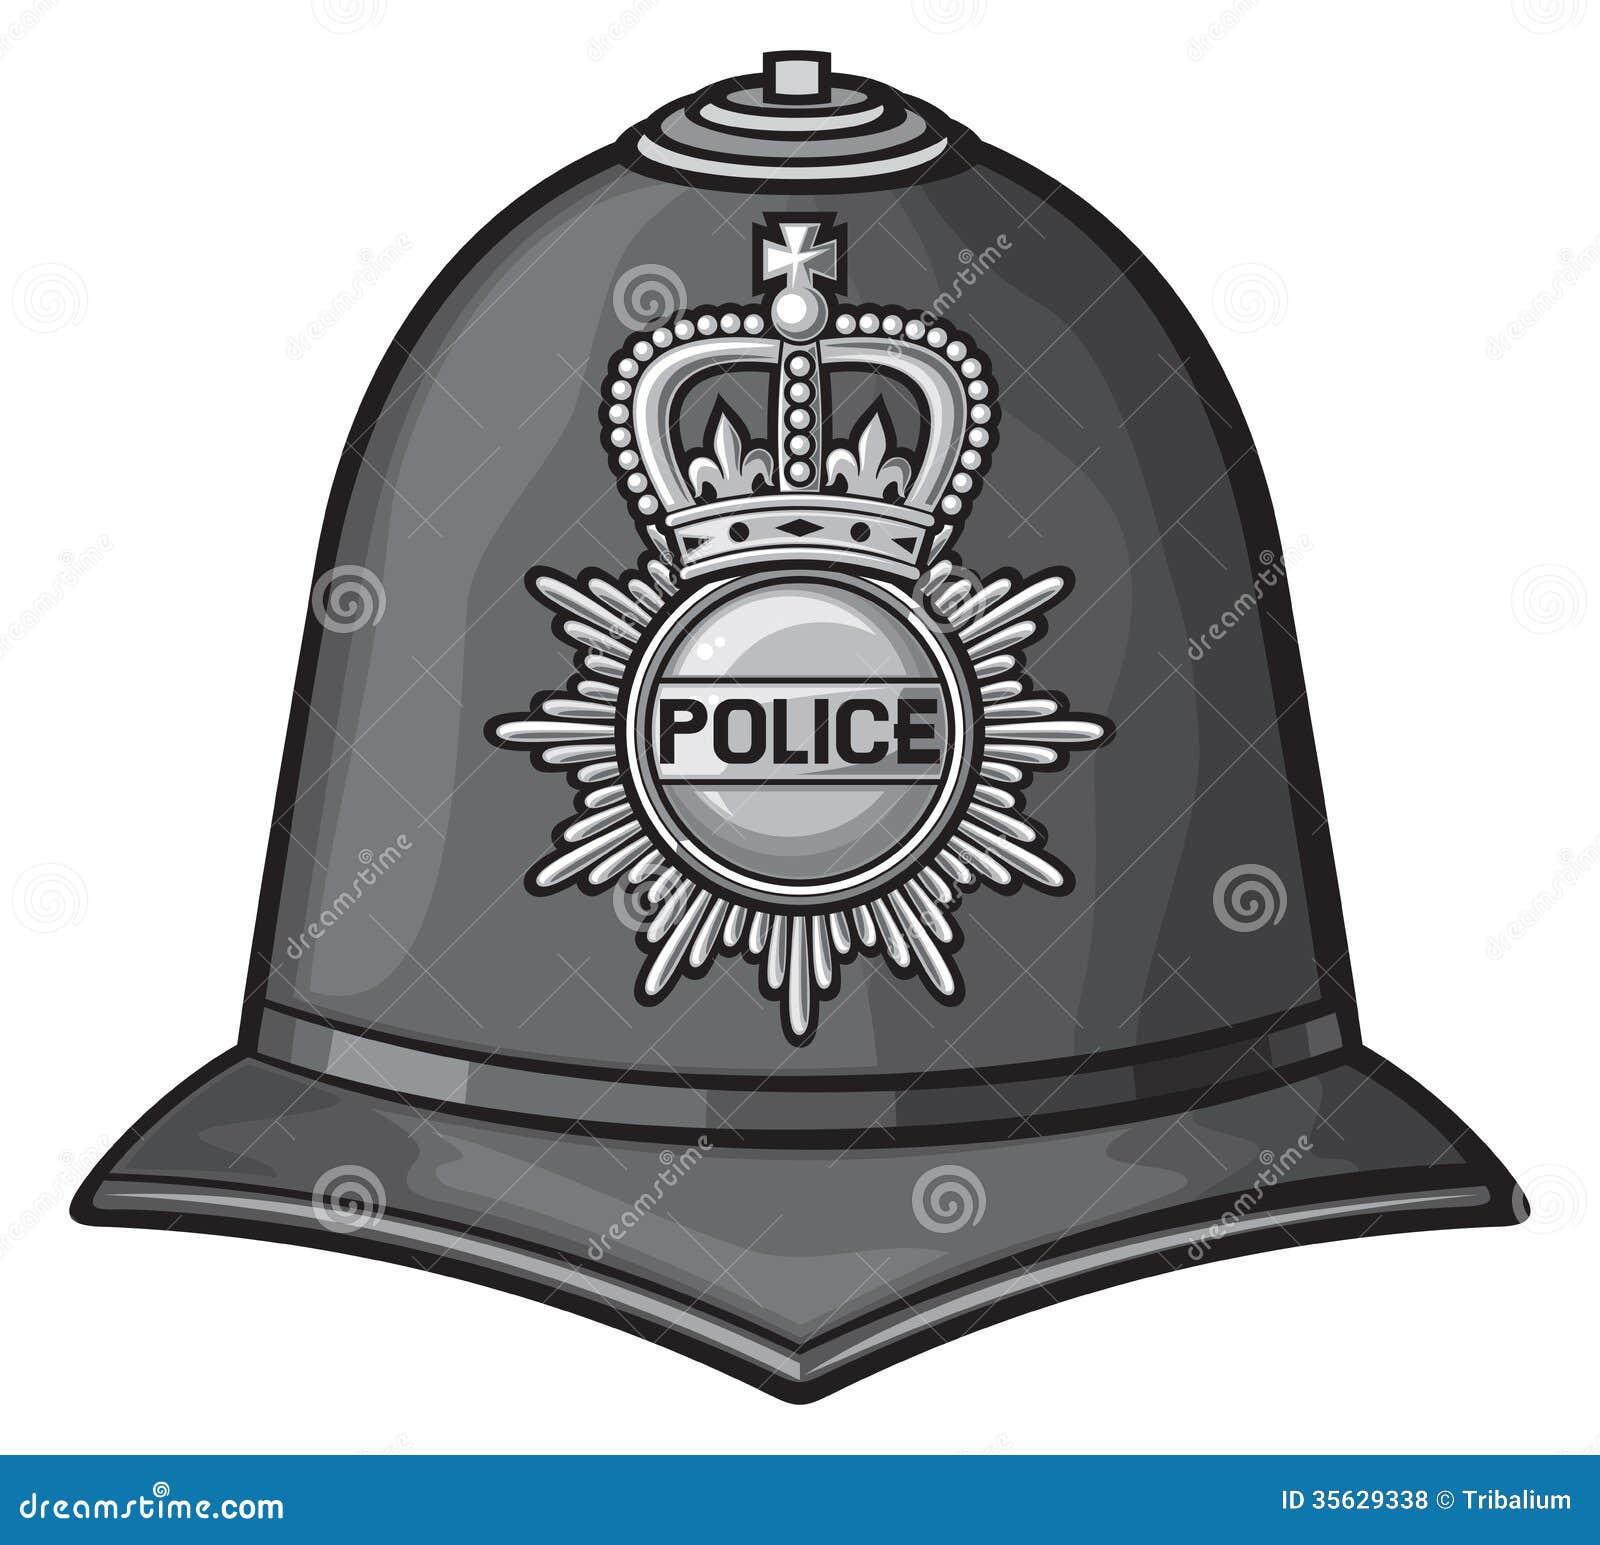 British Police Helmet Royalty Free Stock Photos Image